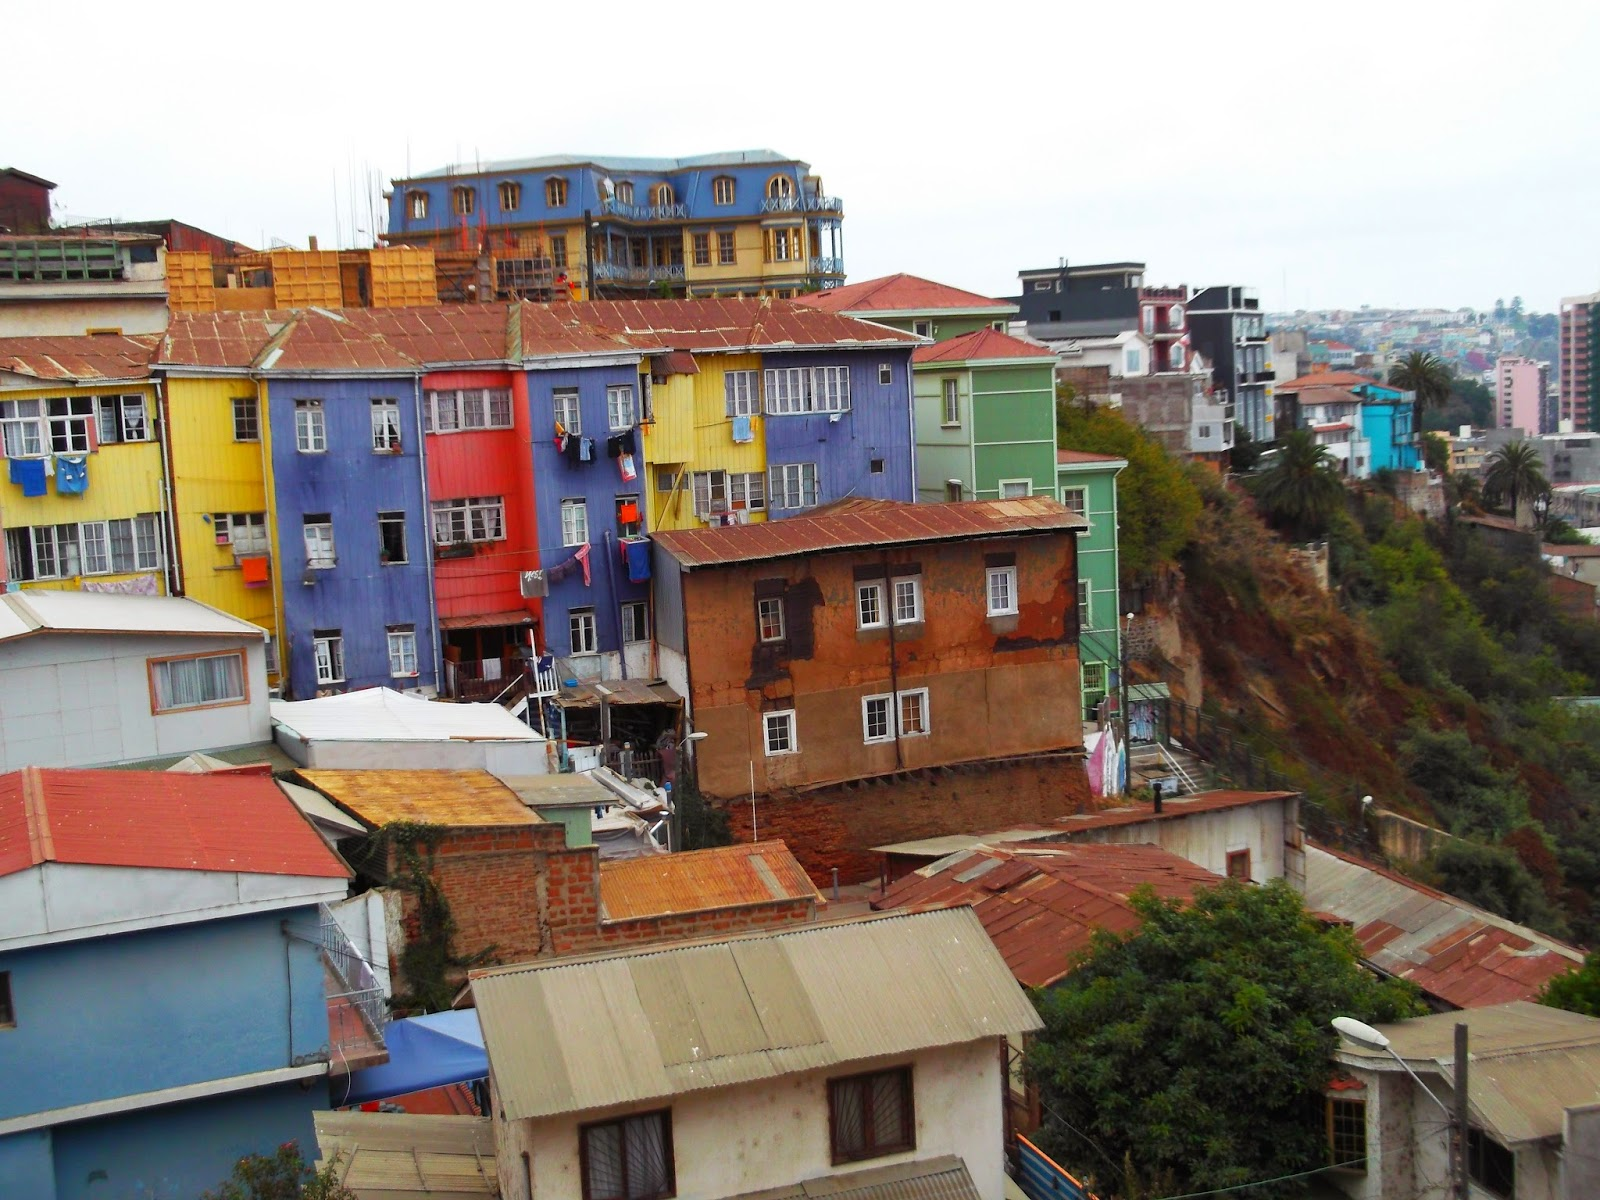 Andy's Travels: Valparaiso and San Pedro de Atacama